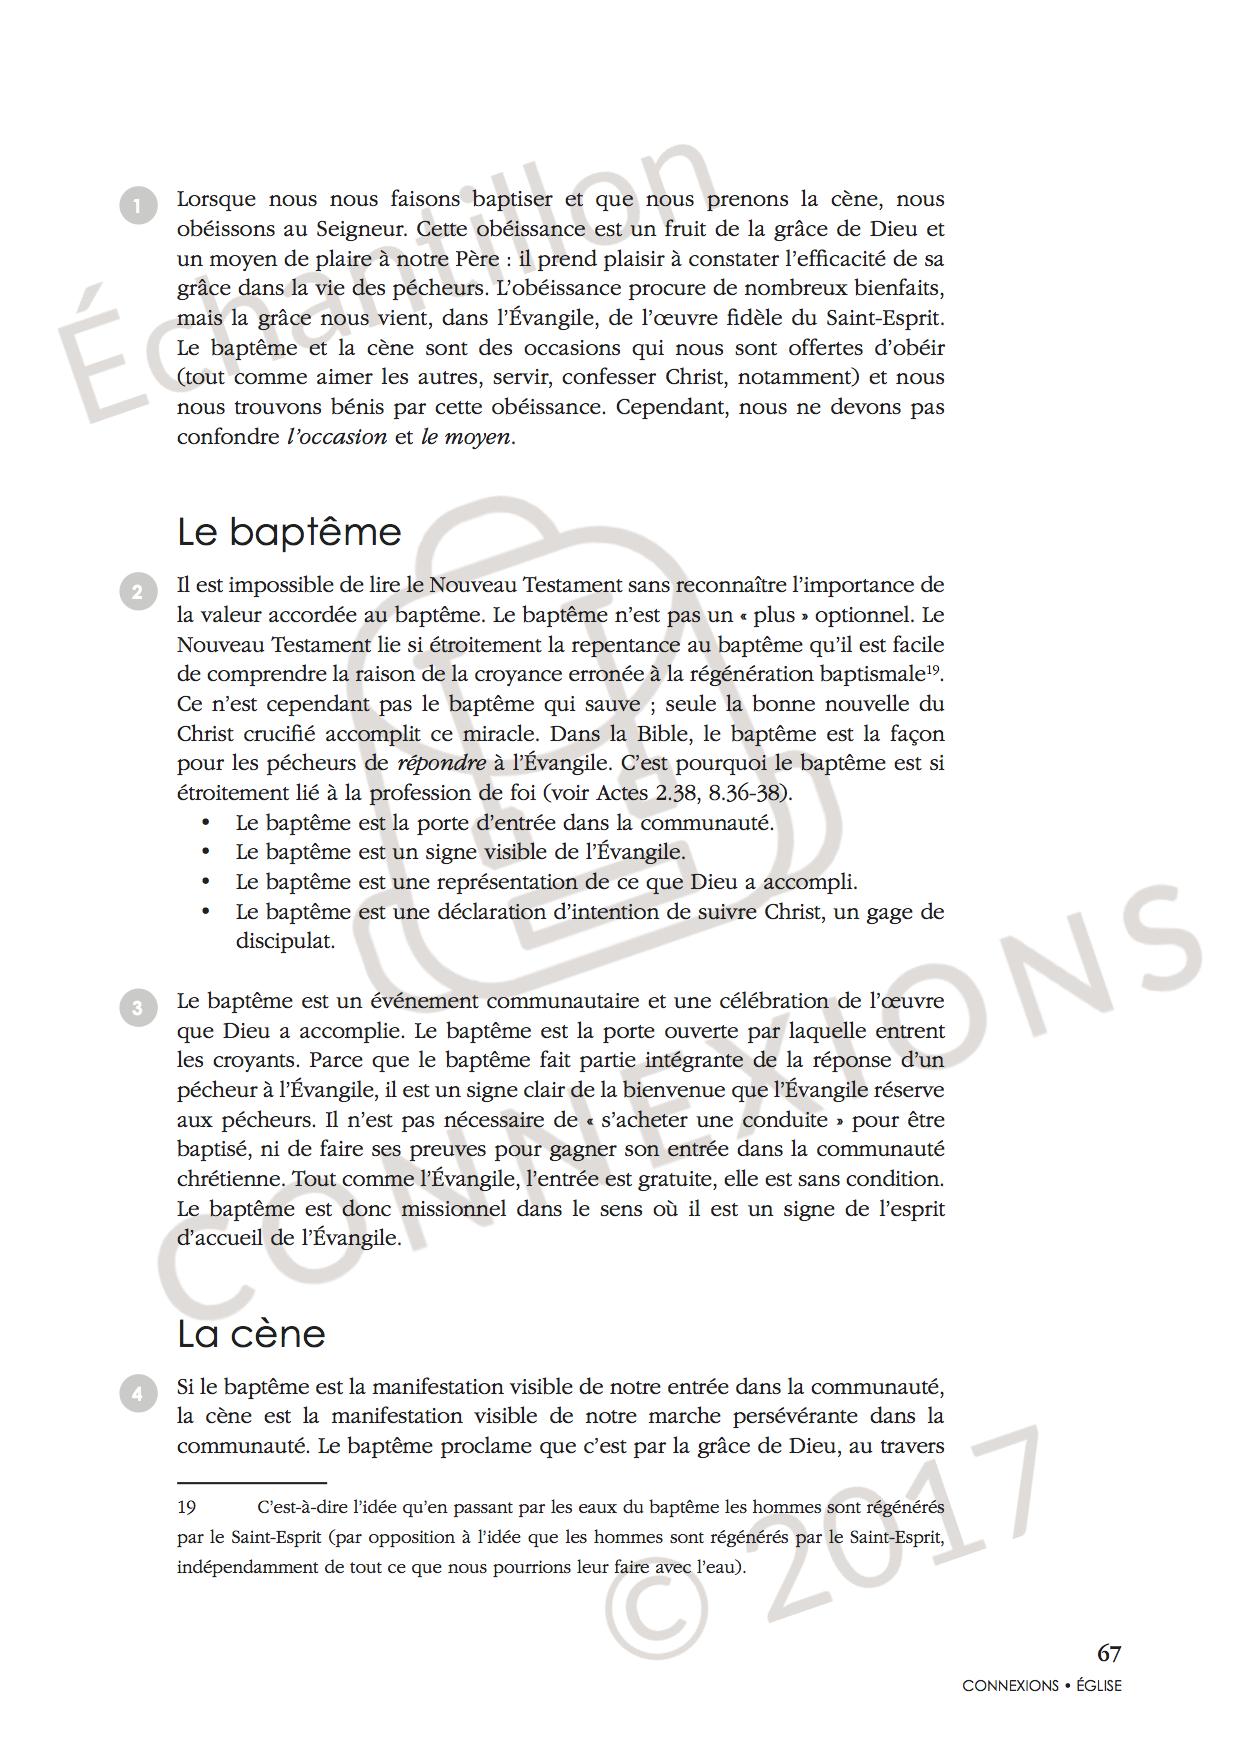 Garder le cap missionnel_sample_published.4.png